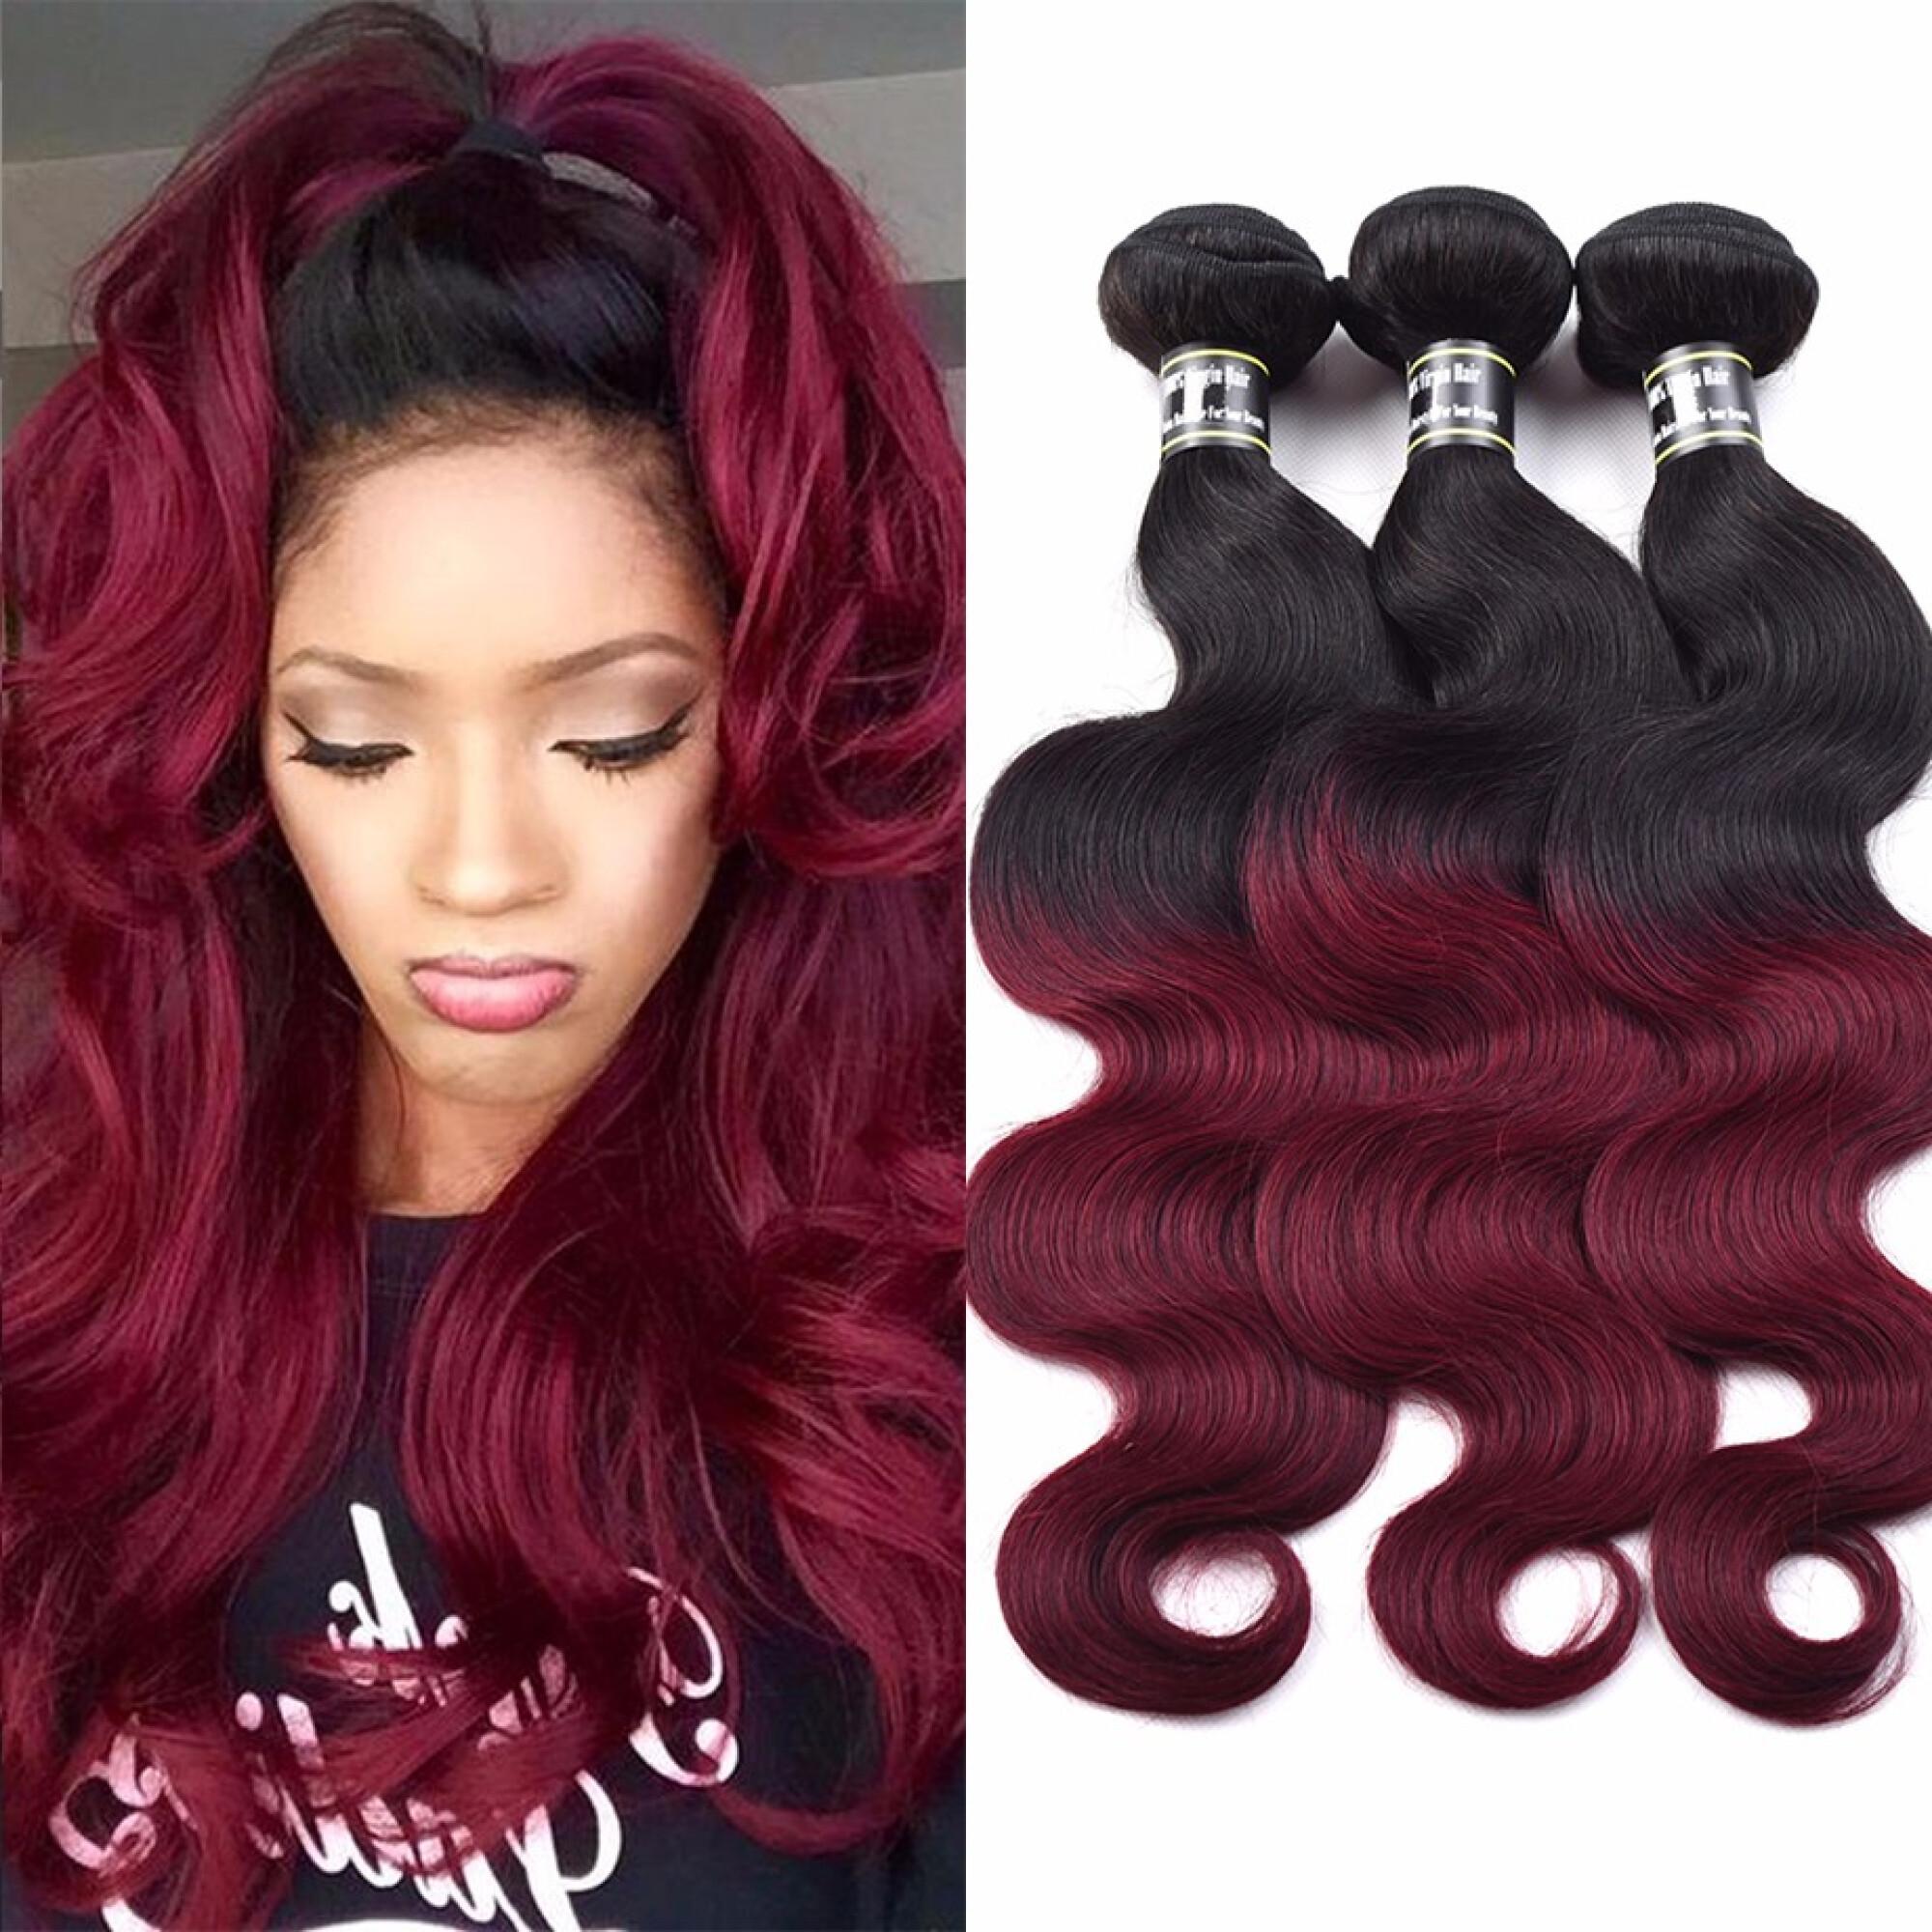 "Amazing Star Brazilian Body Wave Ombre Hair Bundles Burgundy/1B Human Hair Weave, 20""22""24"""